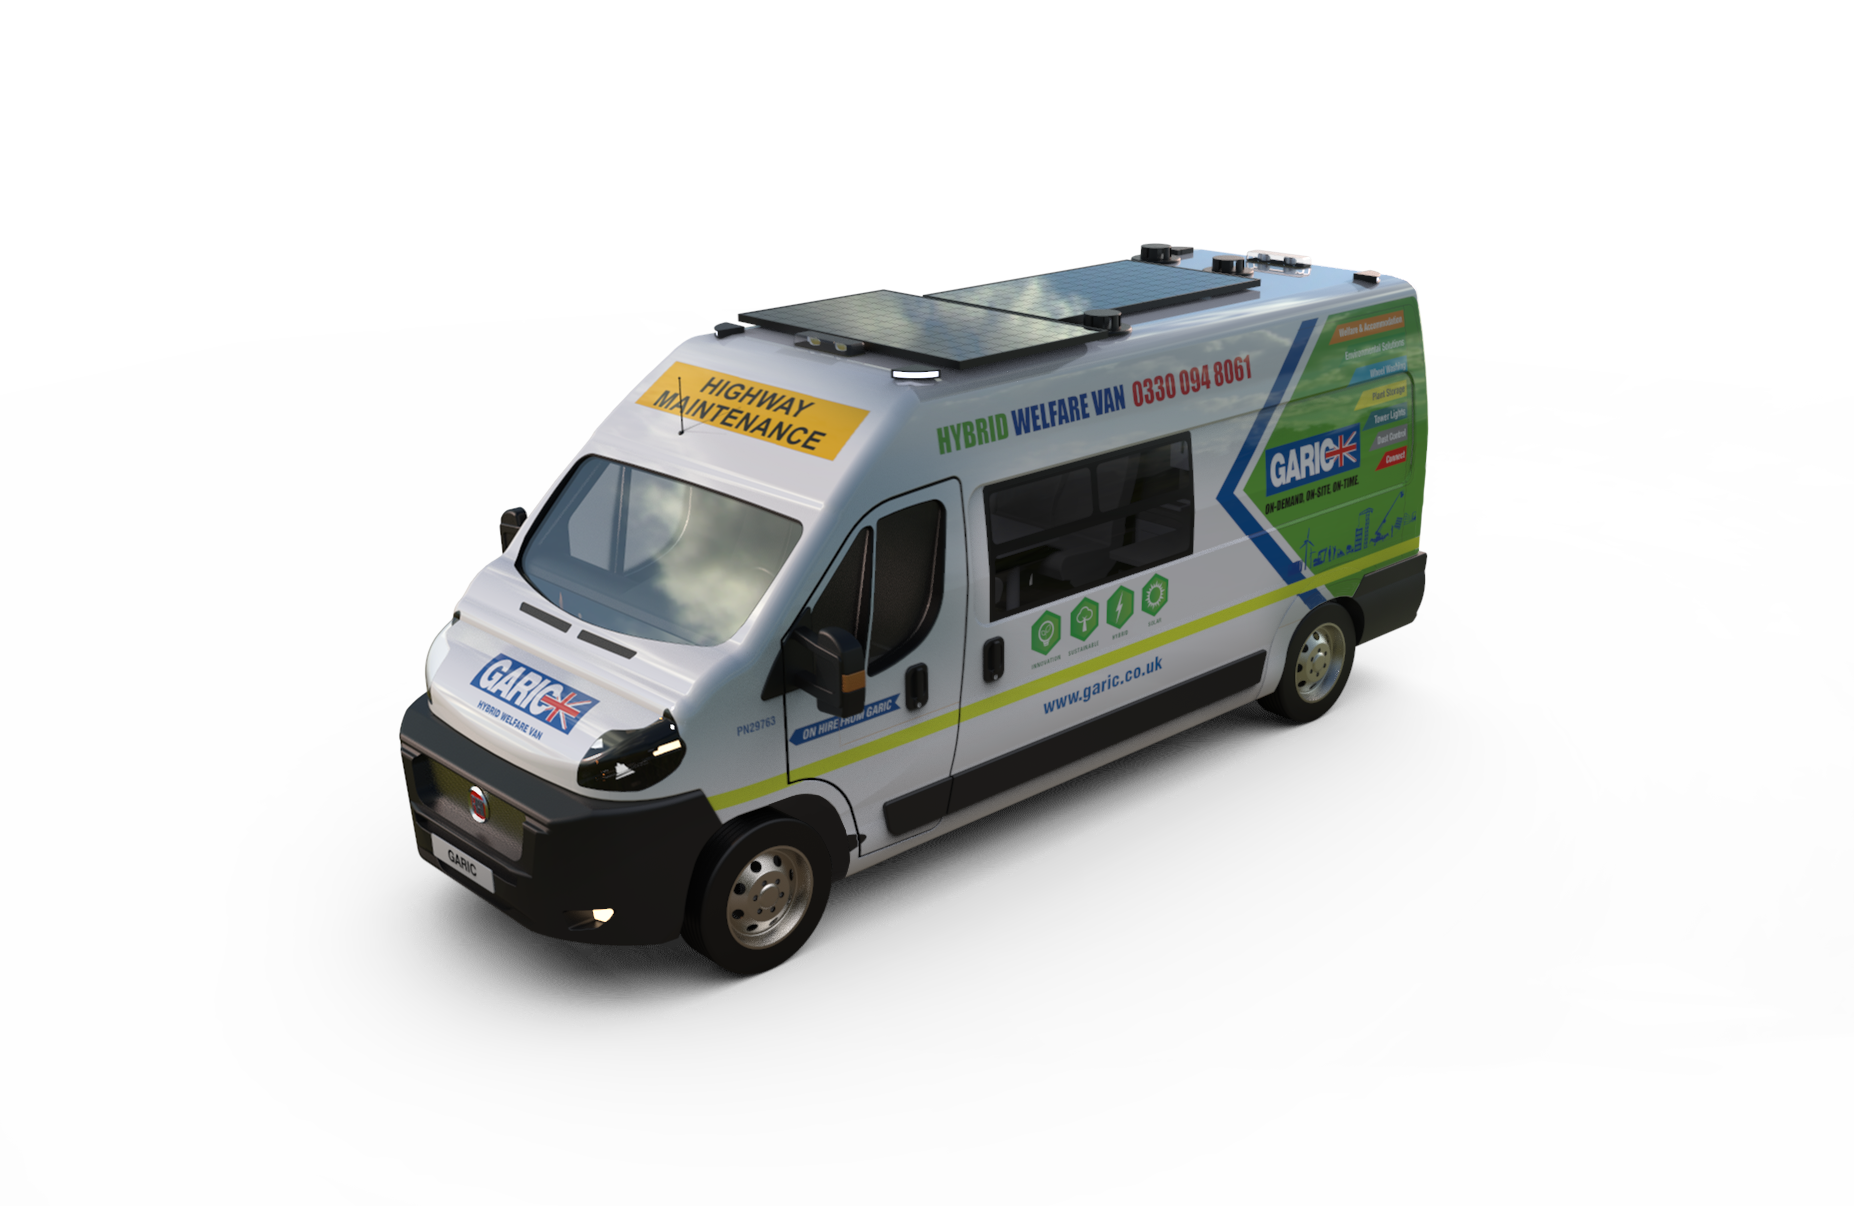 Hybrid Welfare Van-0